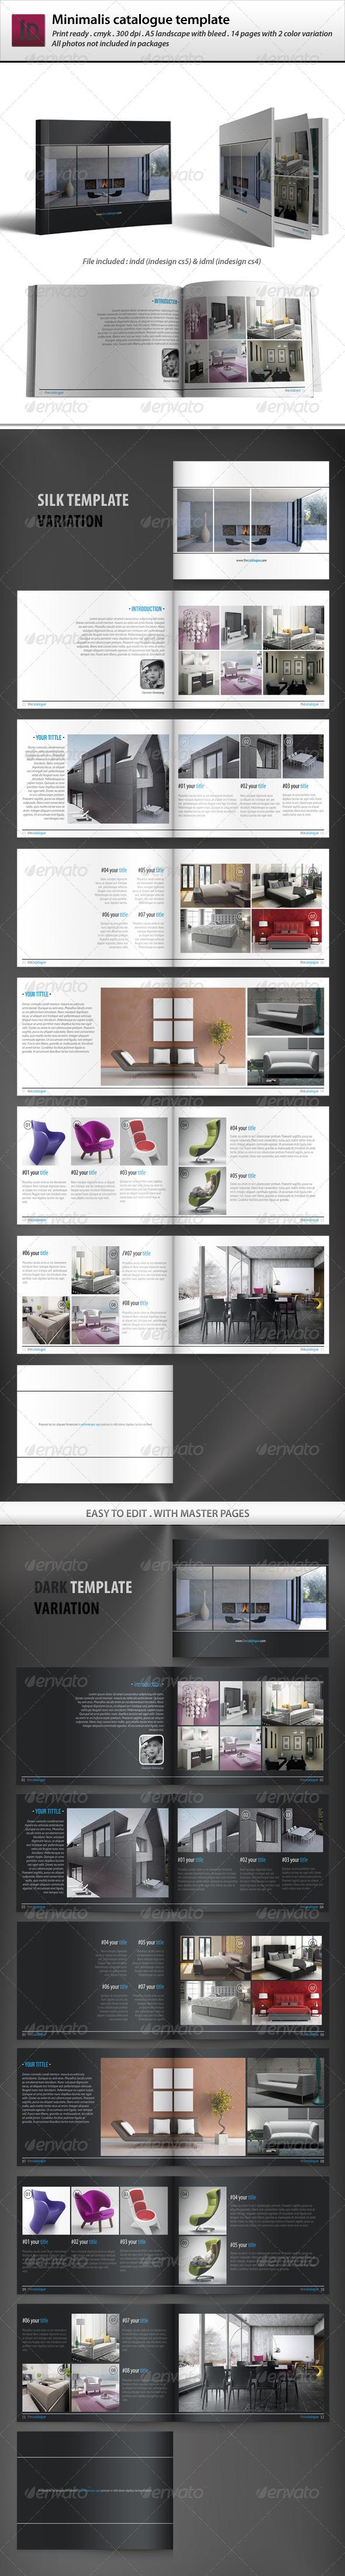 GraphicRiver Minimalis Catalogue Template 4230310